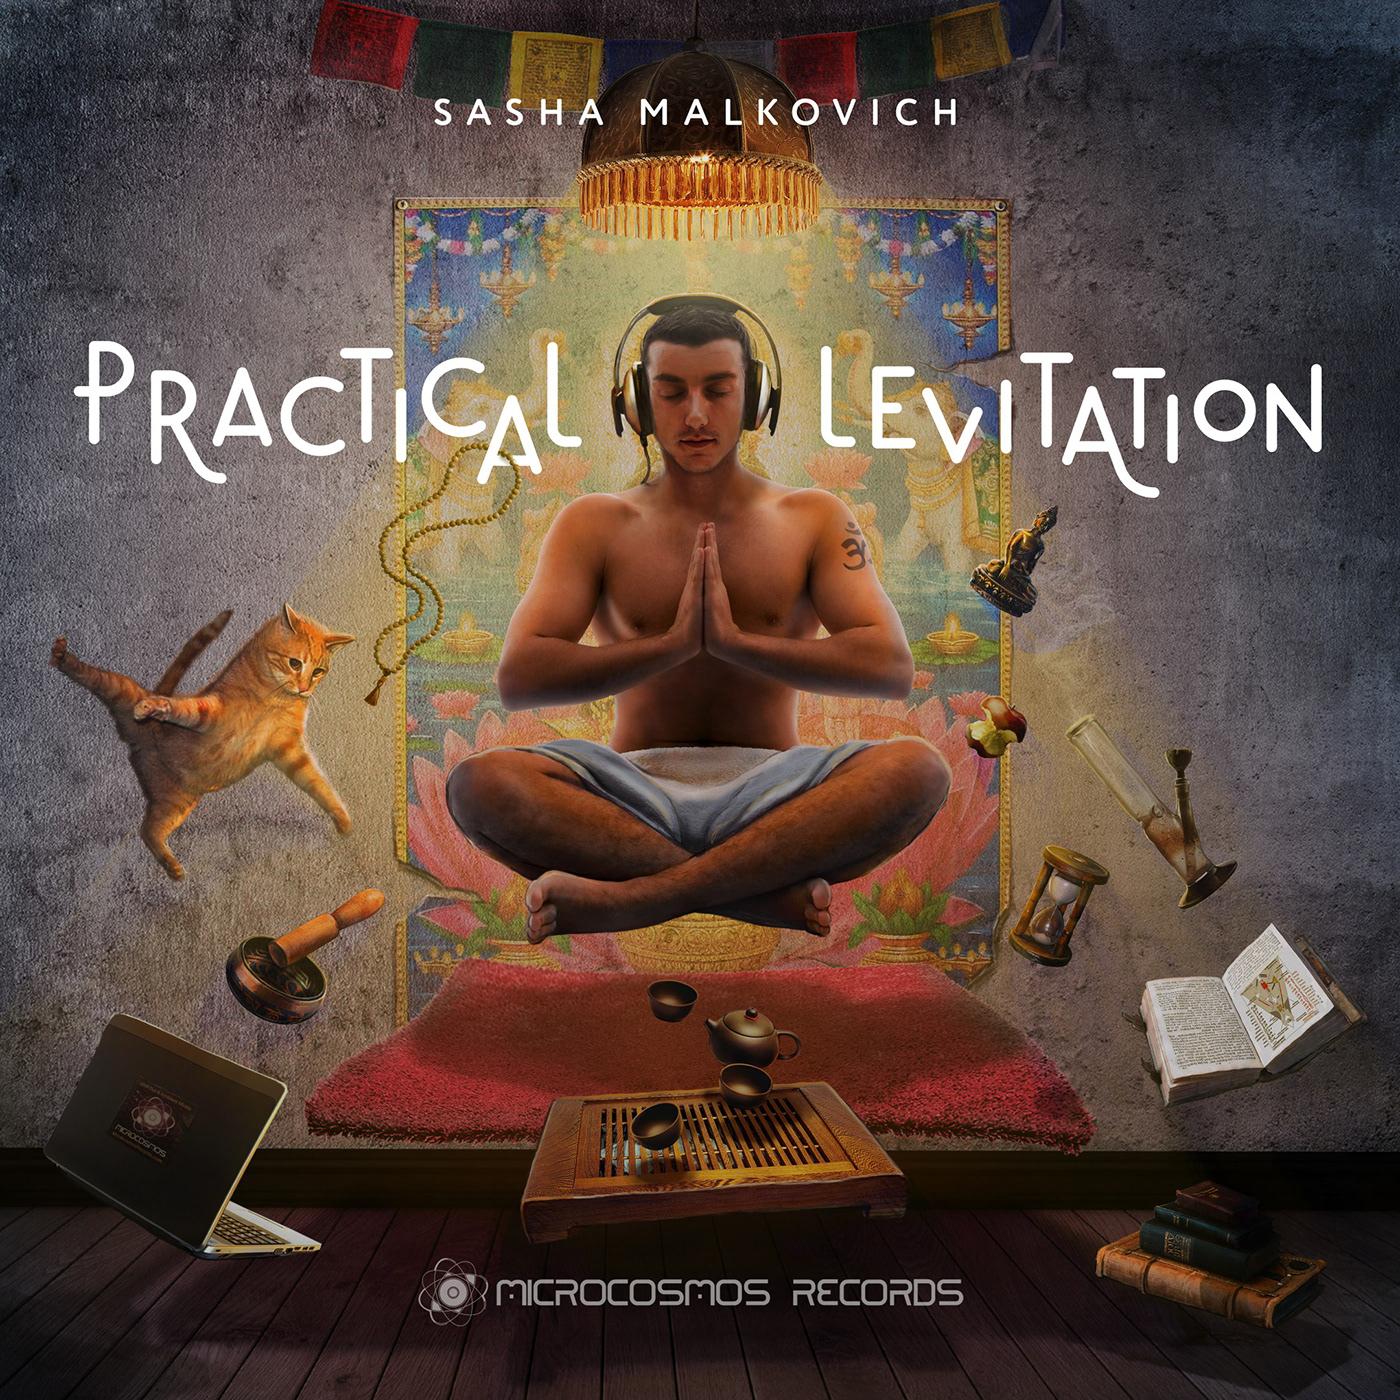 art cover digitalart esoteric fantasy ILLUSTRATION  man Mattepainting music sacred